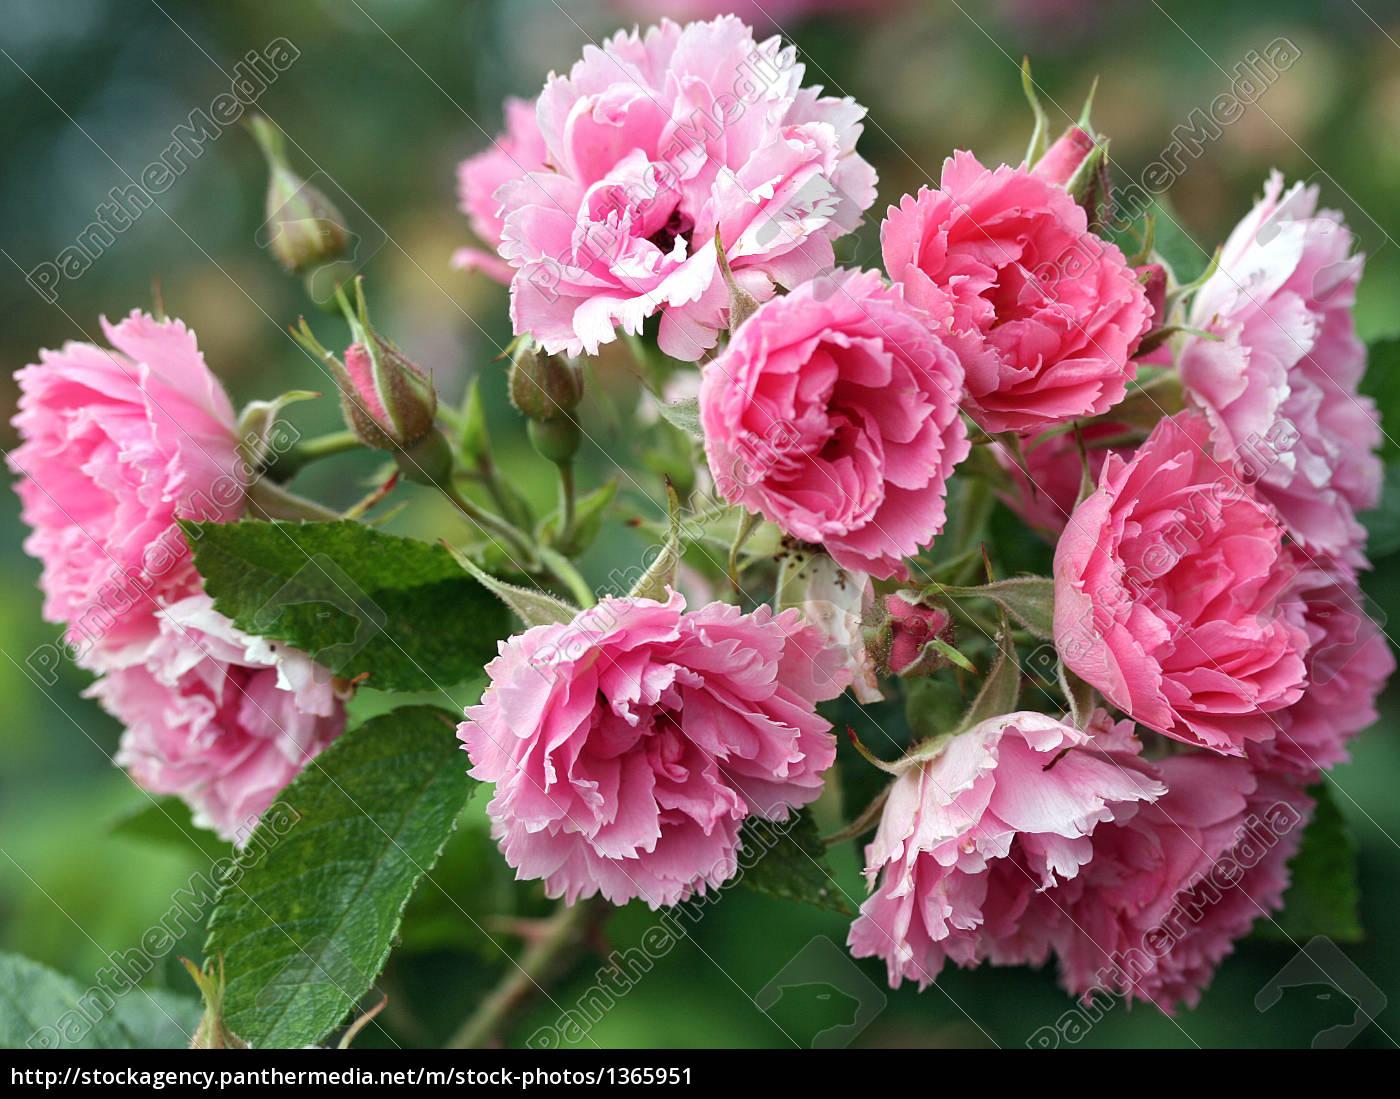 pink, grootendorst - 1365951